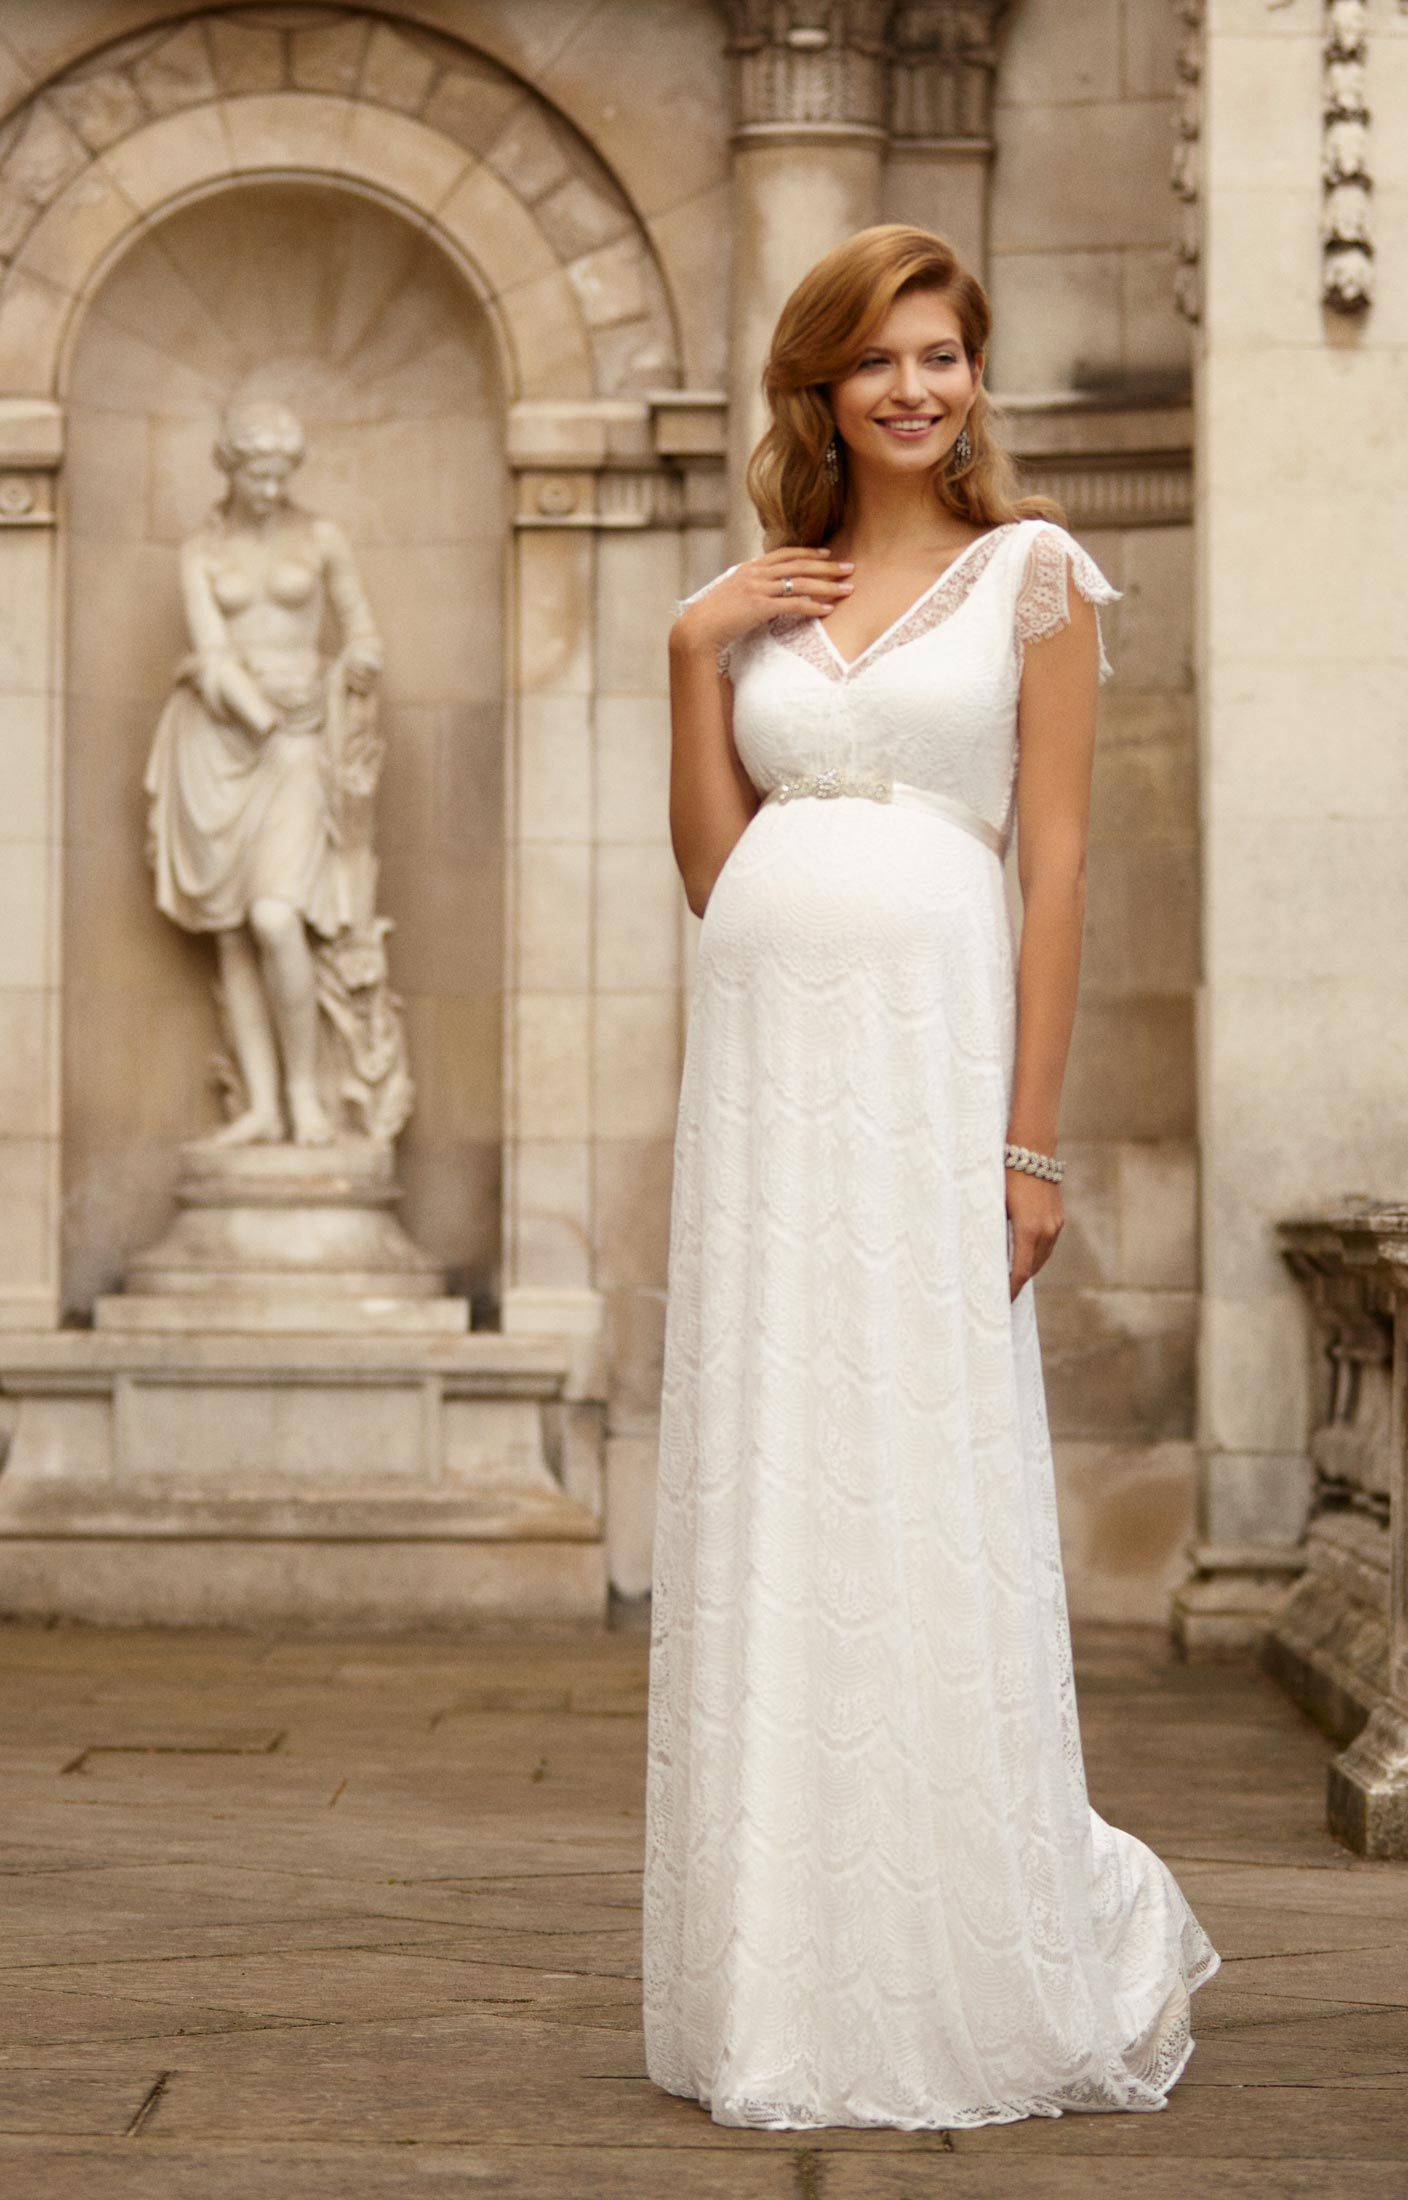 Gorgeous Maternity Wedding Dresses By Tiffany Rose  Brautkleid